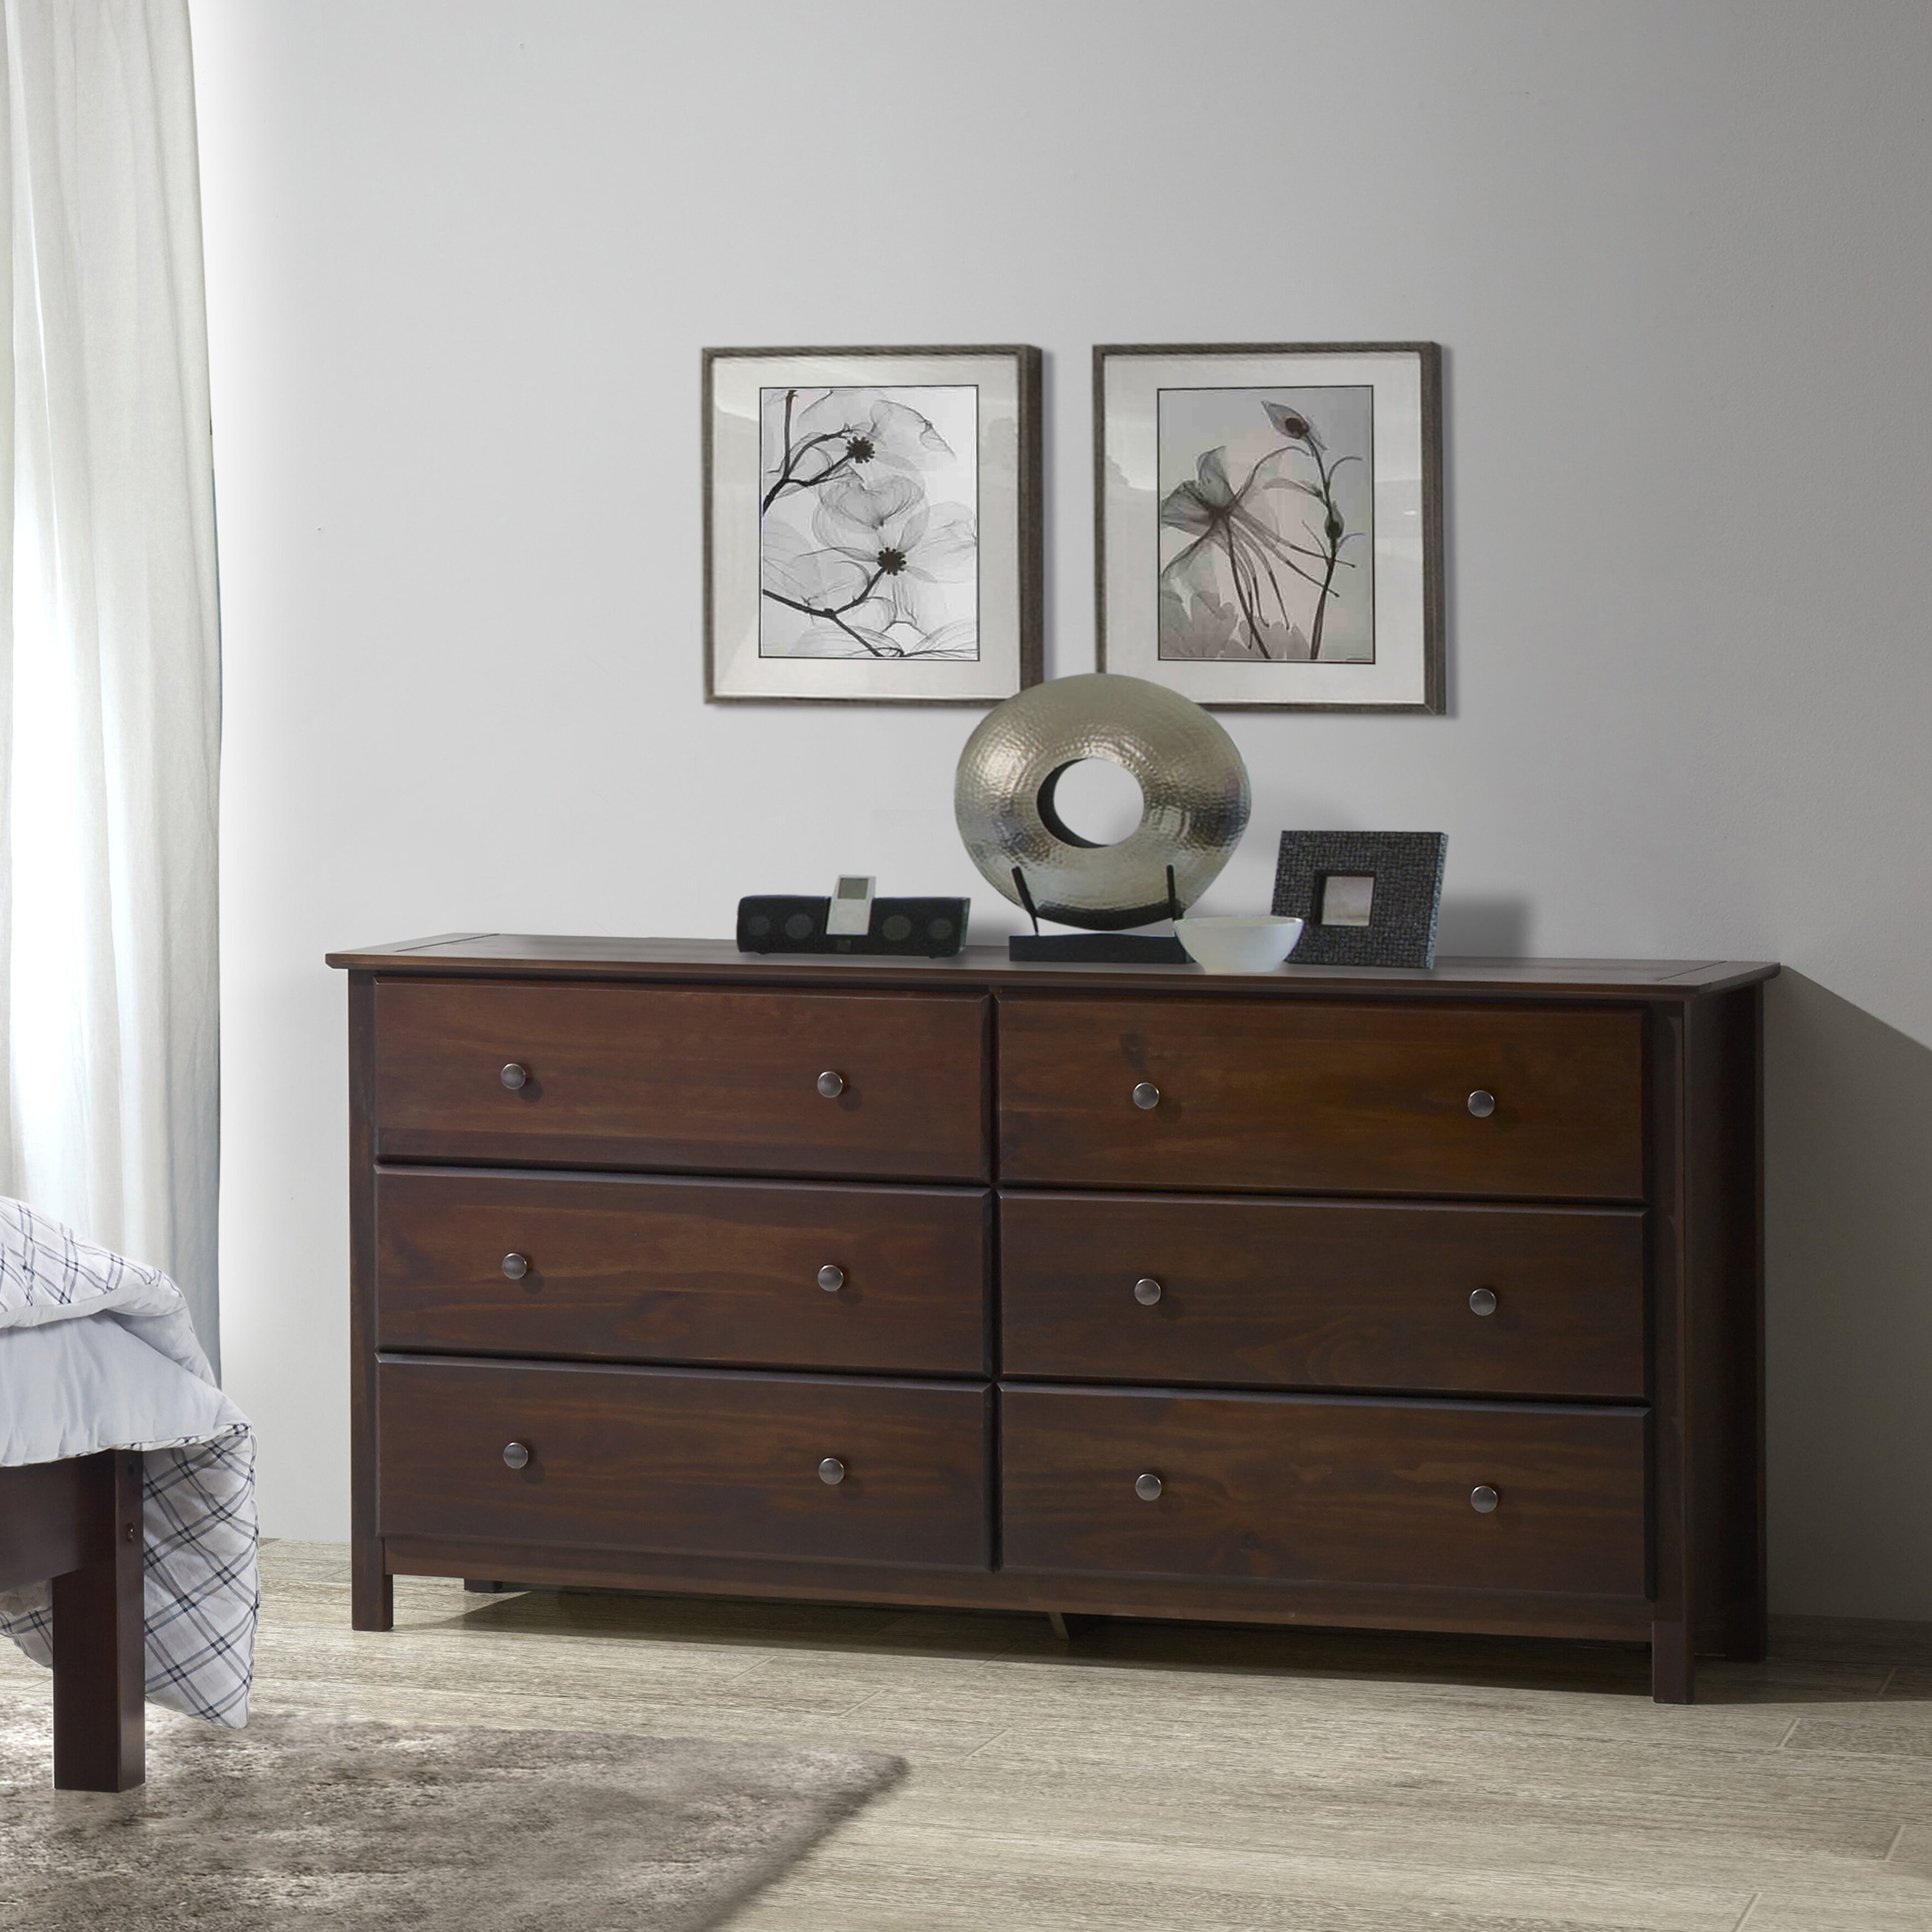 Grain wood furniture shaker 6 drawer dresser reviews for Shaker furniture